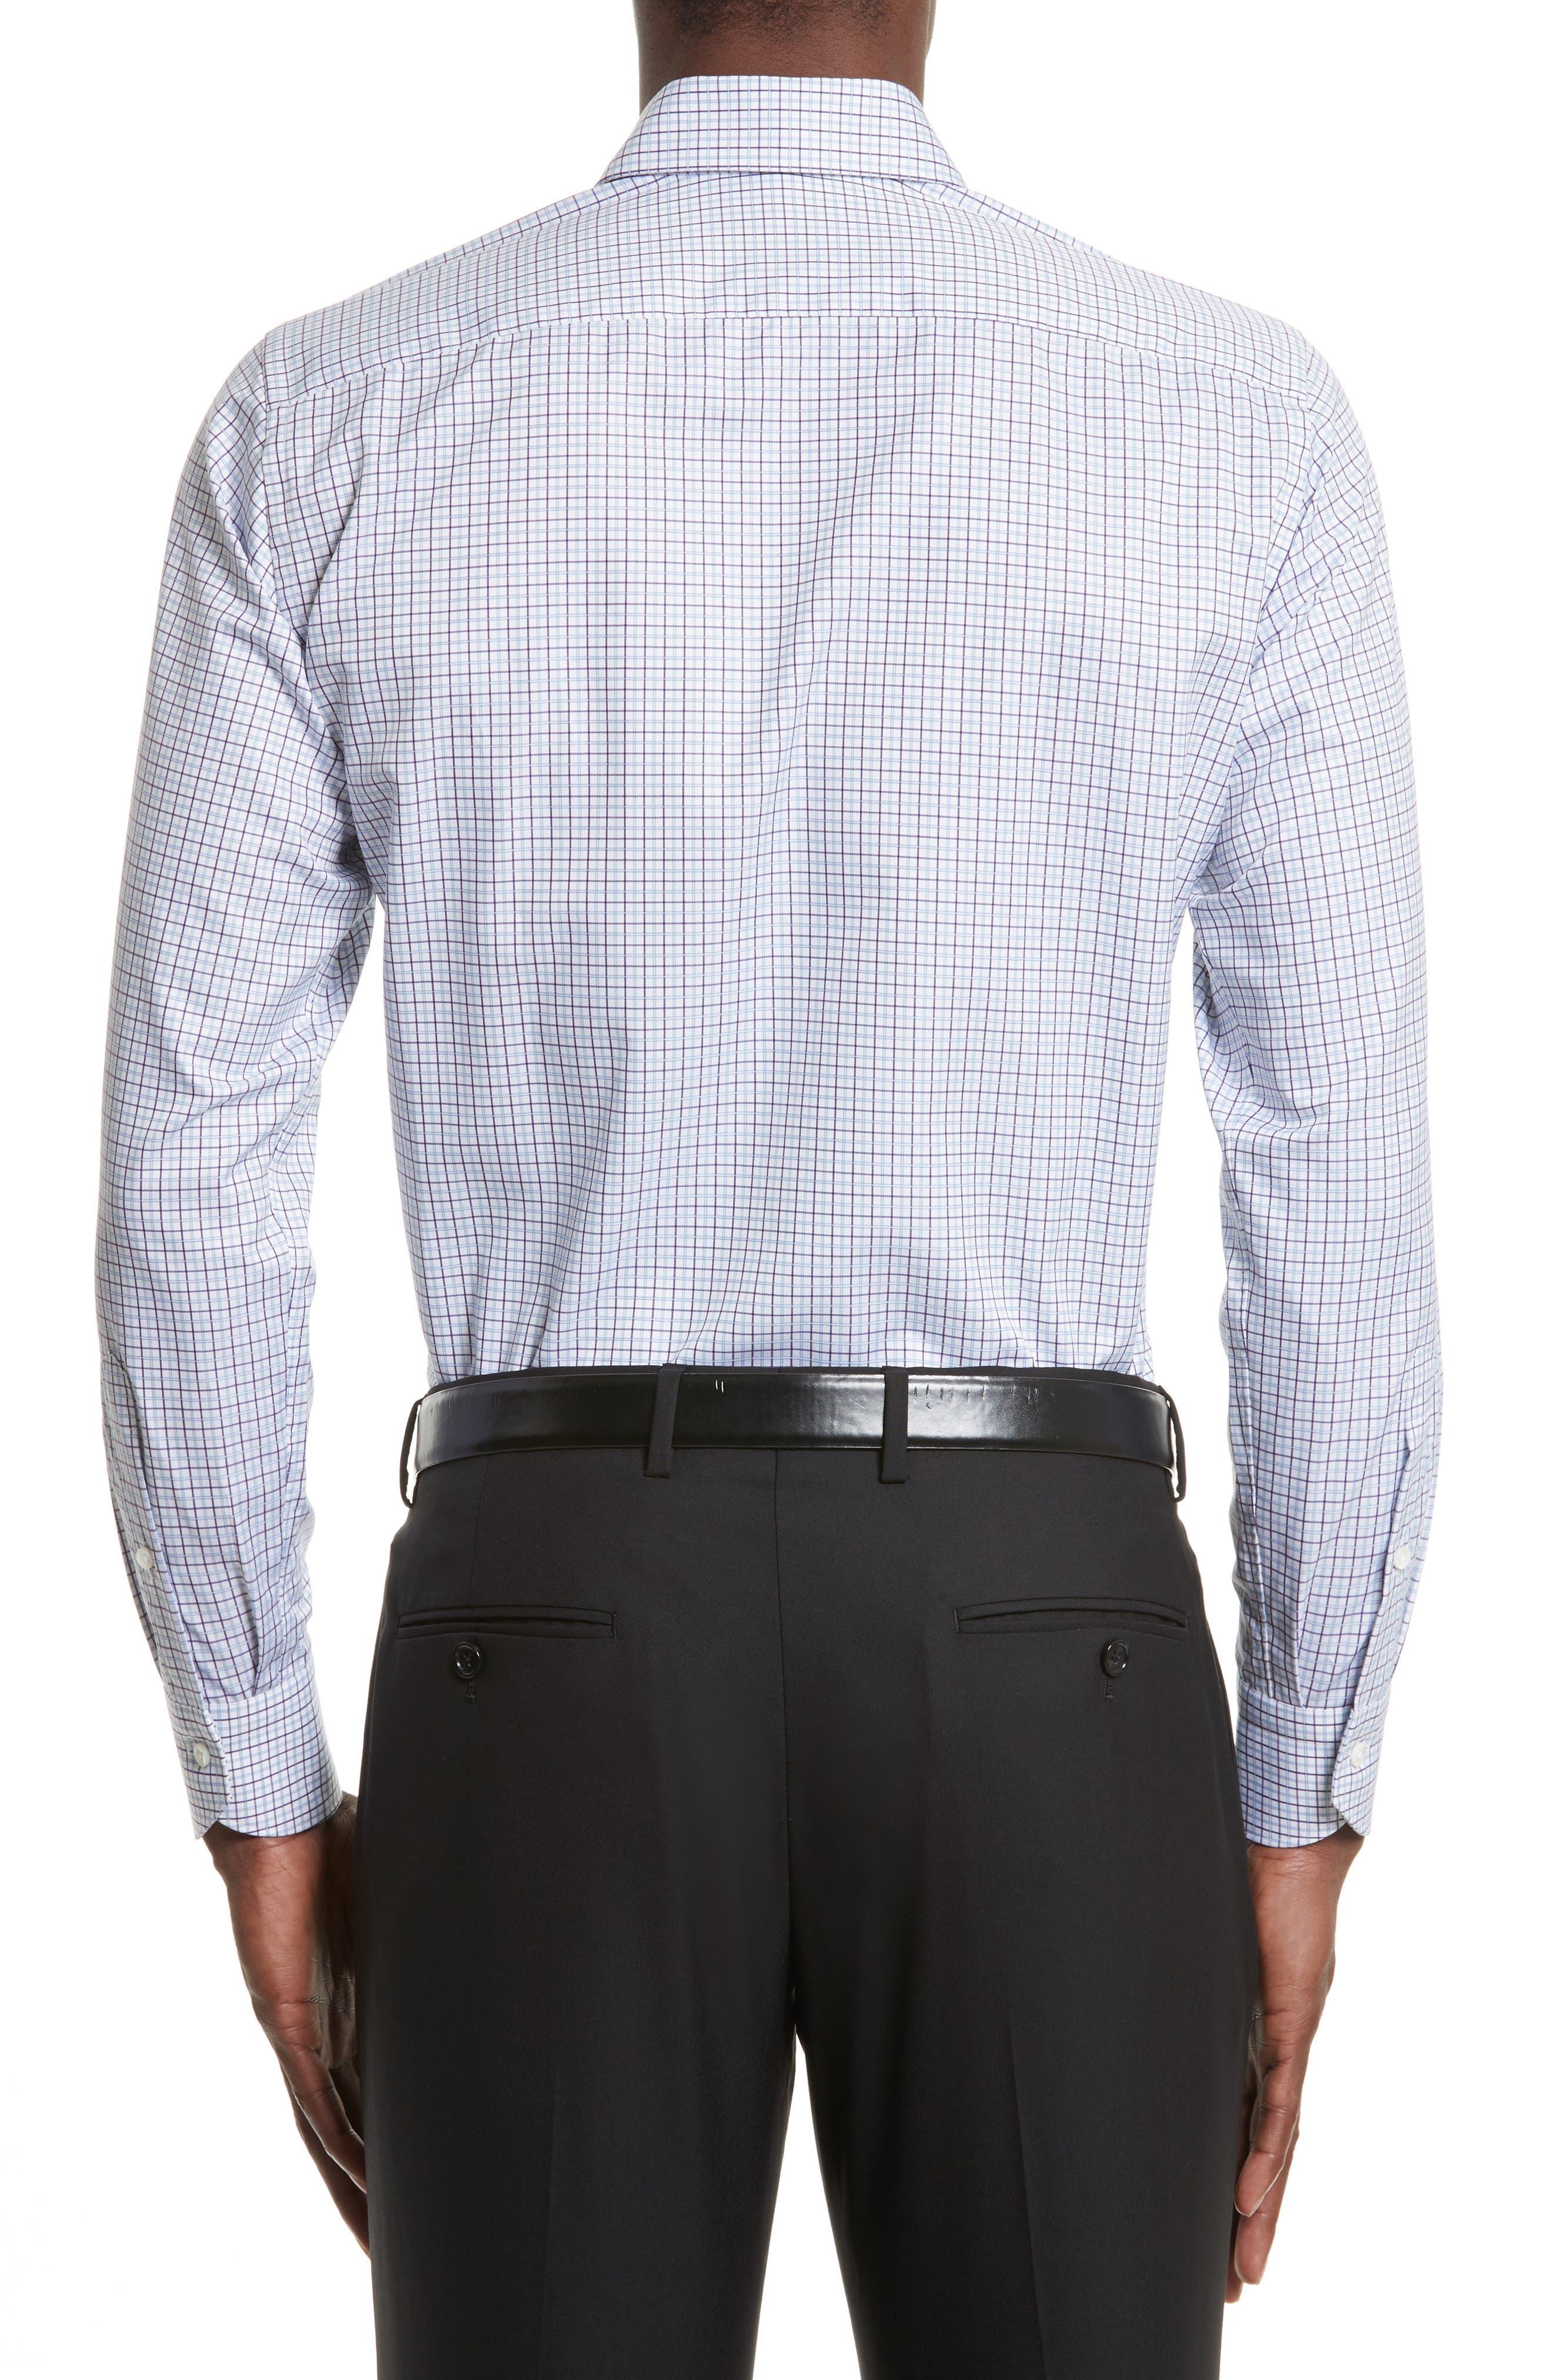 Regular Fit Check Dress Shirt,                             Alternate thumbnail 2, color,                             540